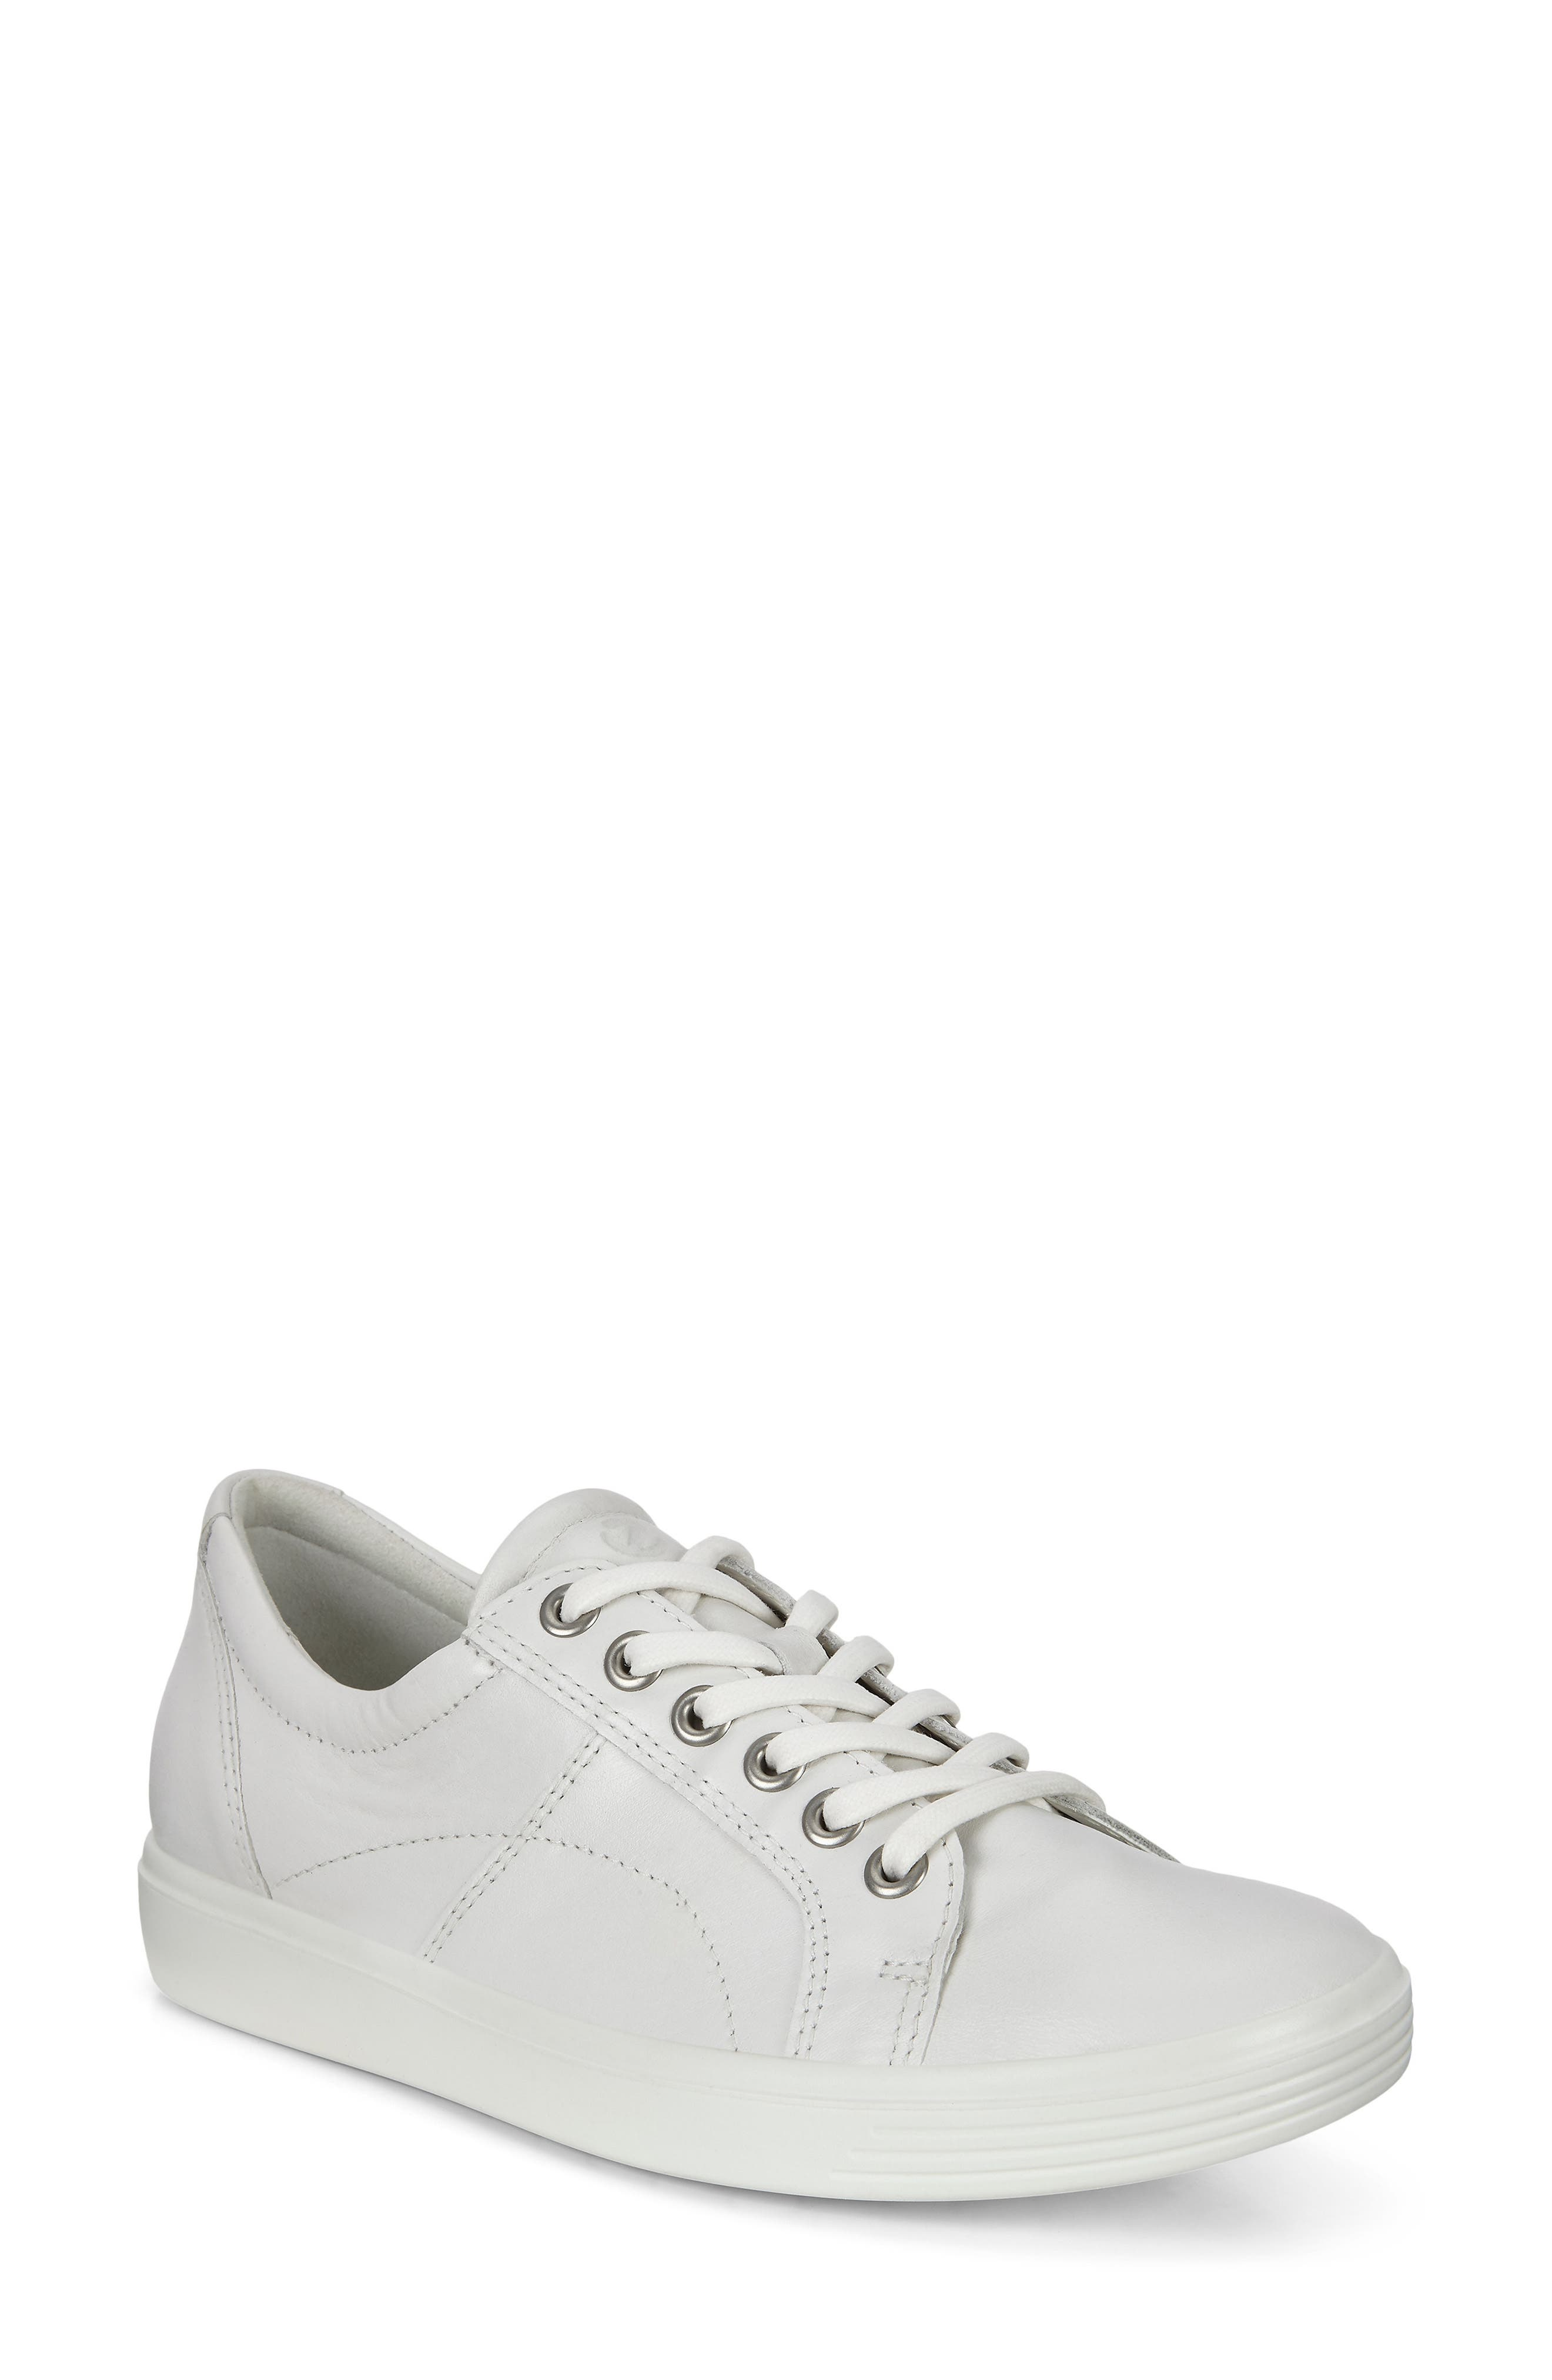 Women's ECCO Sneakers \u0026 Athletic Shoes